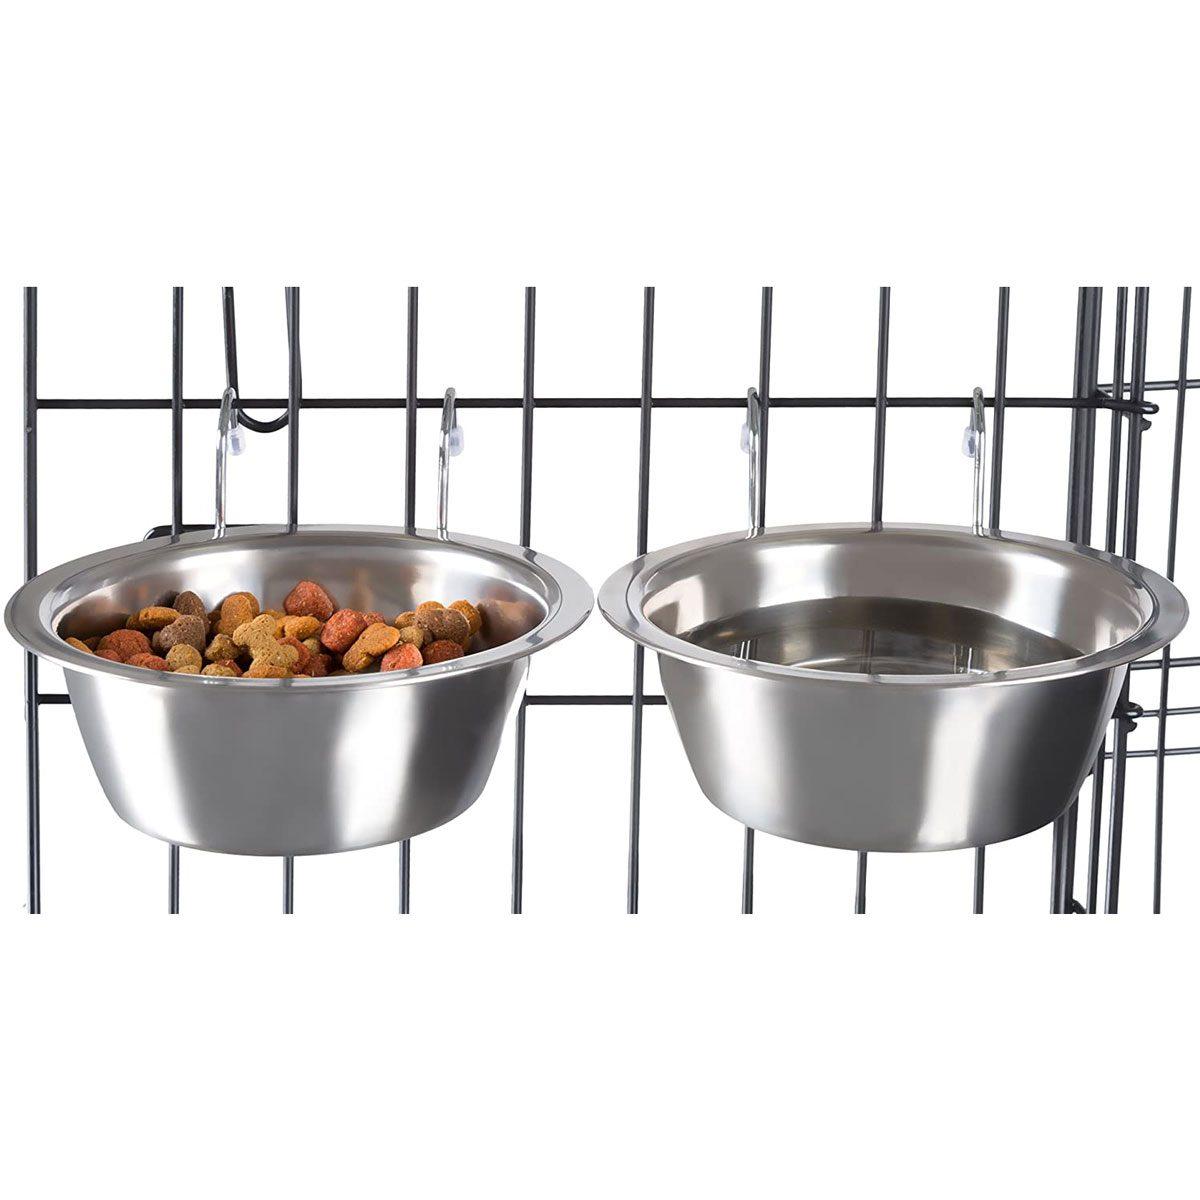 Dog crate bowls